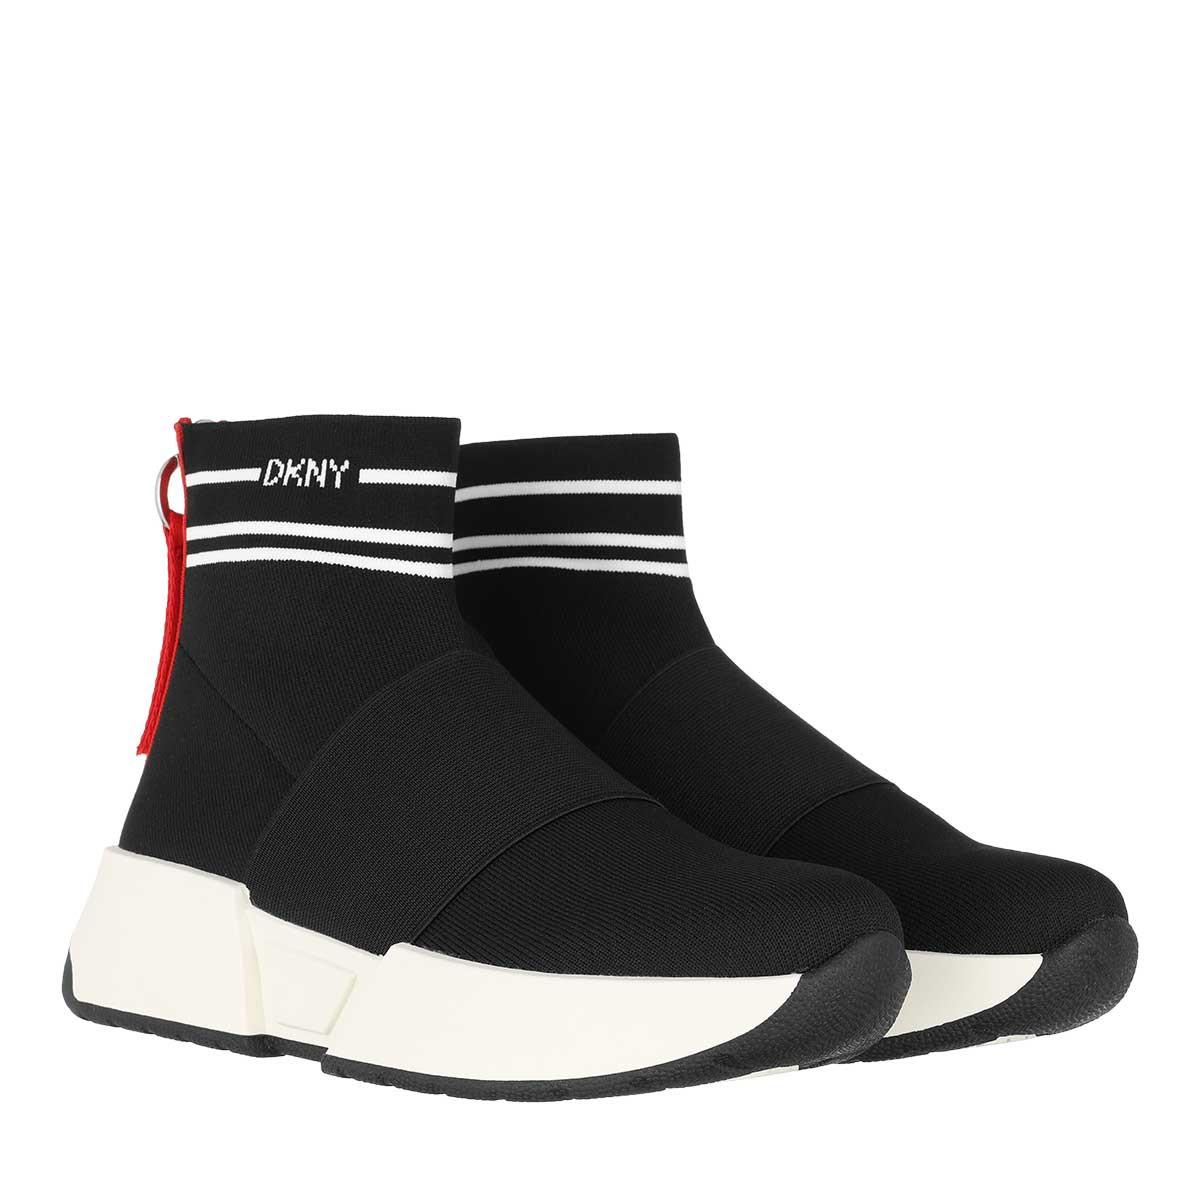 DKNY Sneakers - Marini Slip On Sneaker Black White - in schwarz - für Damen